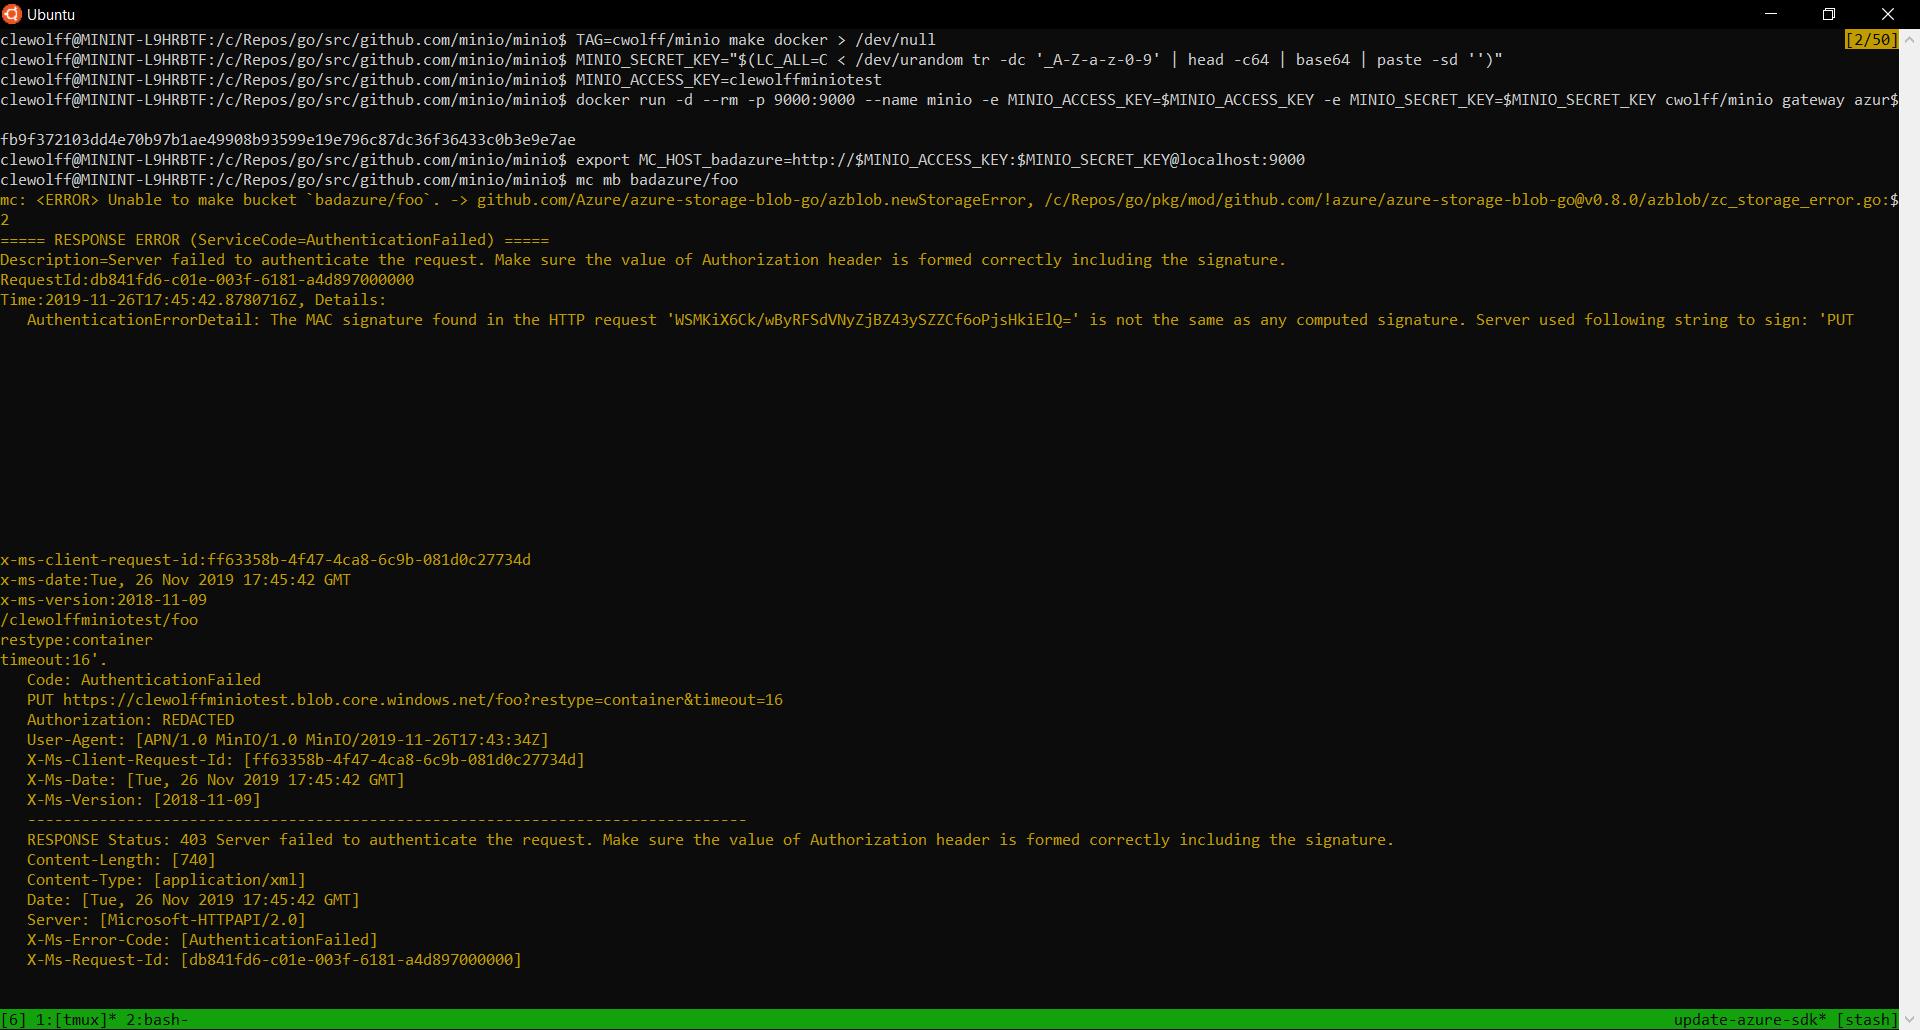 Screenshot showing 403 error with mc client